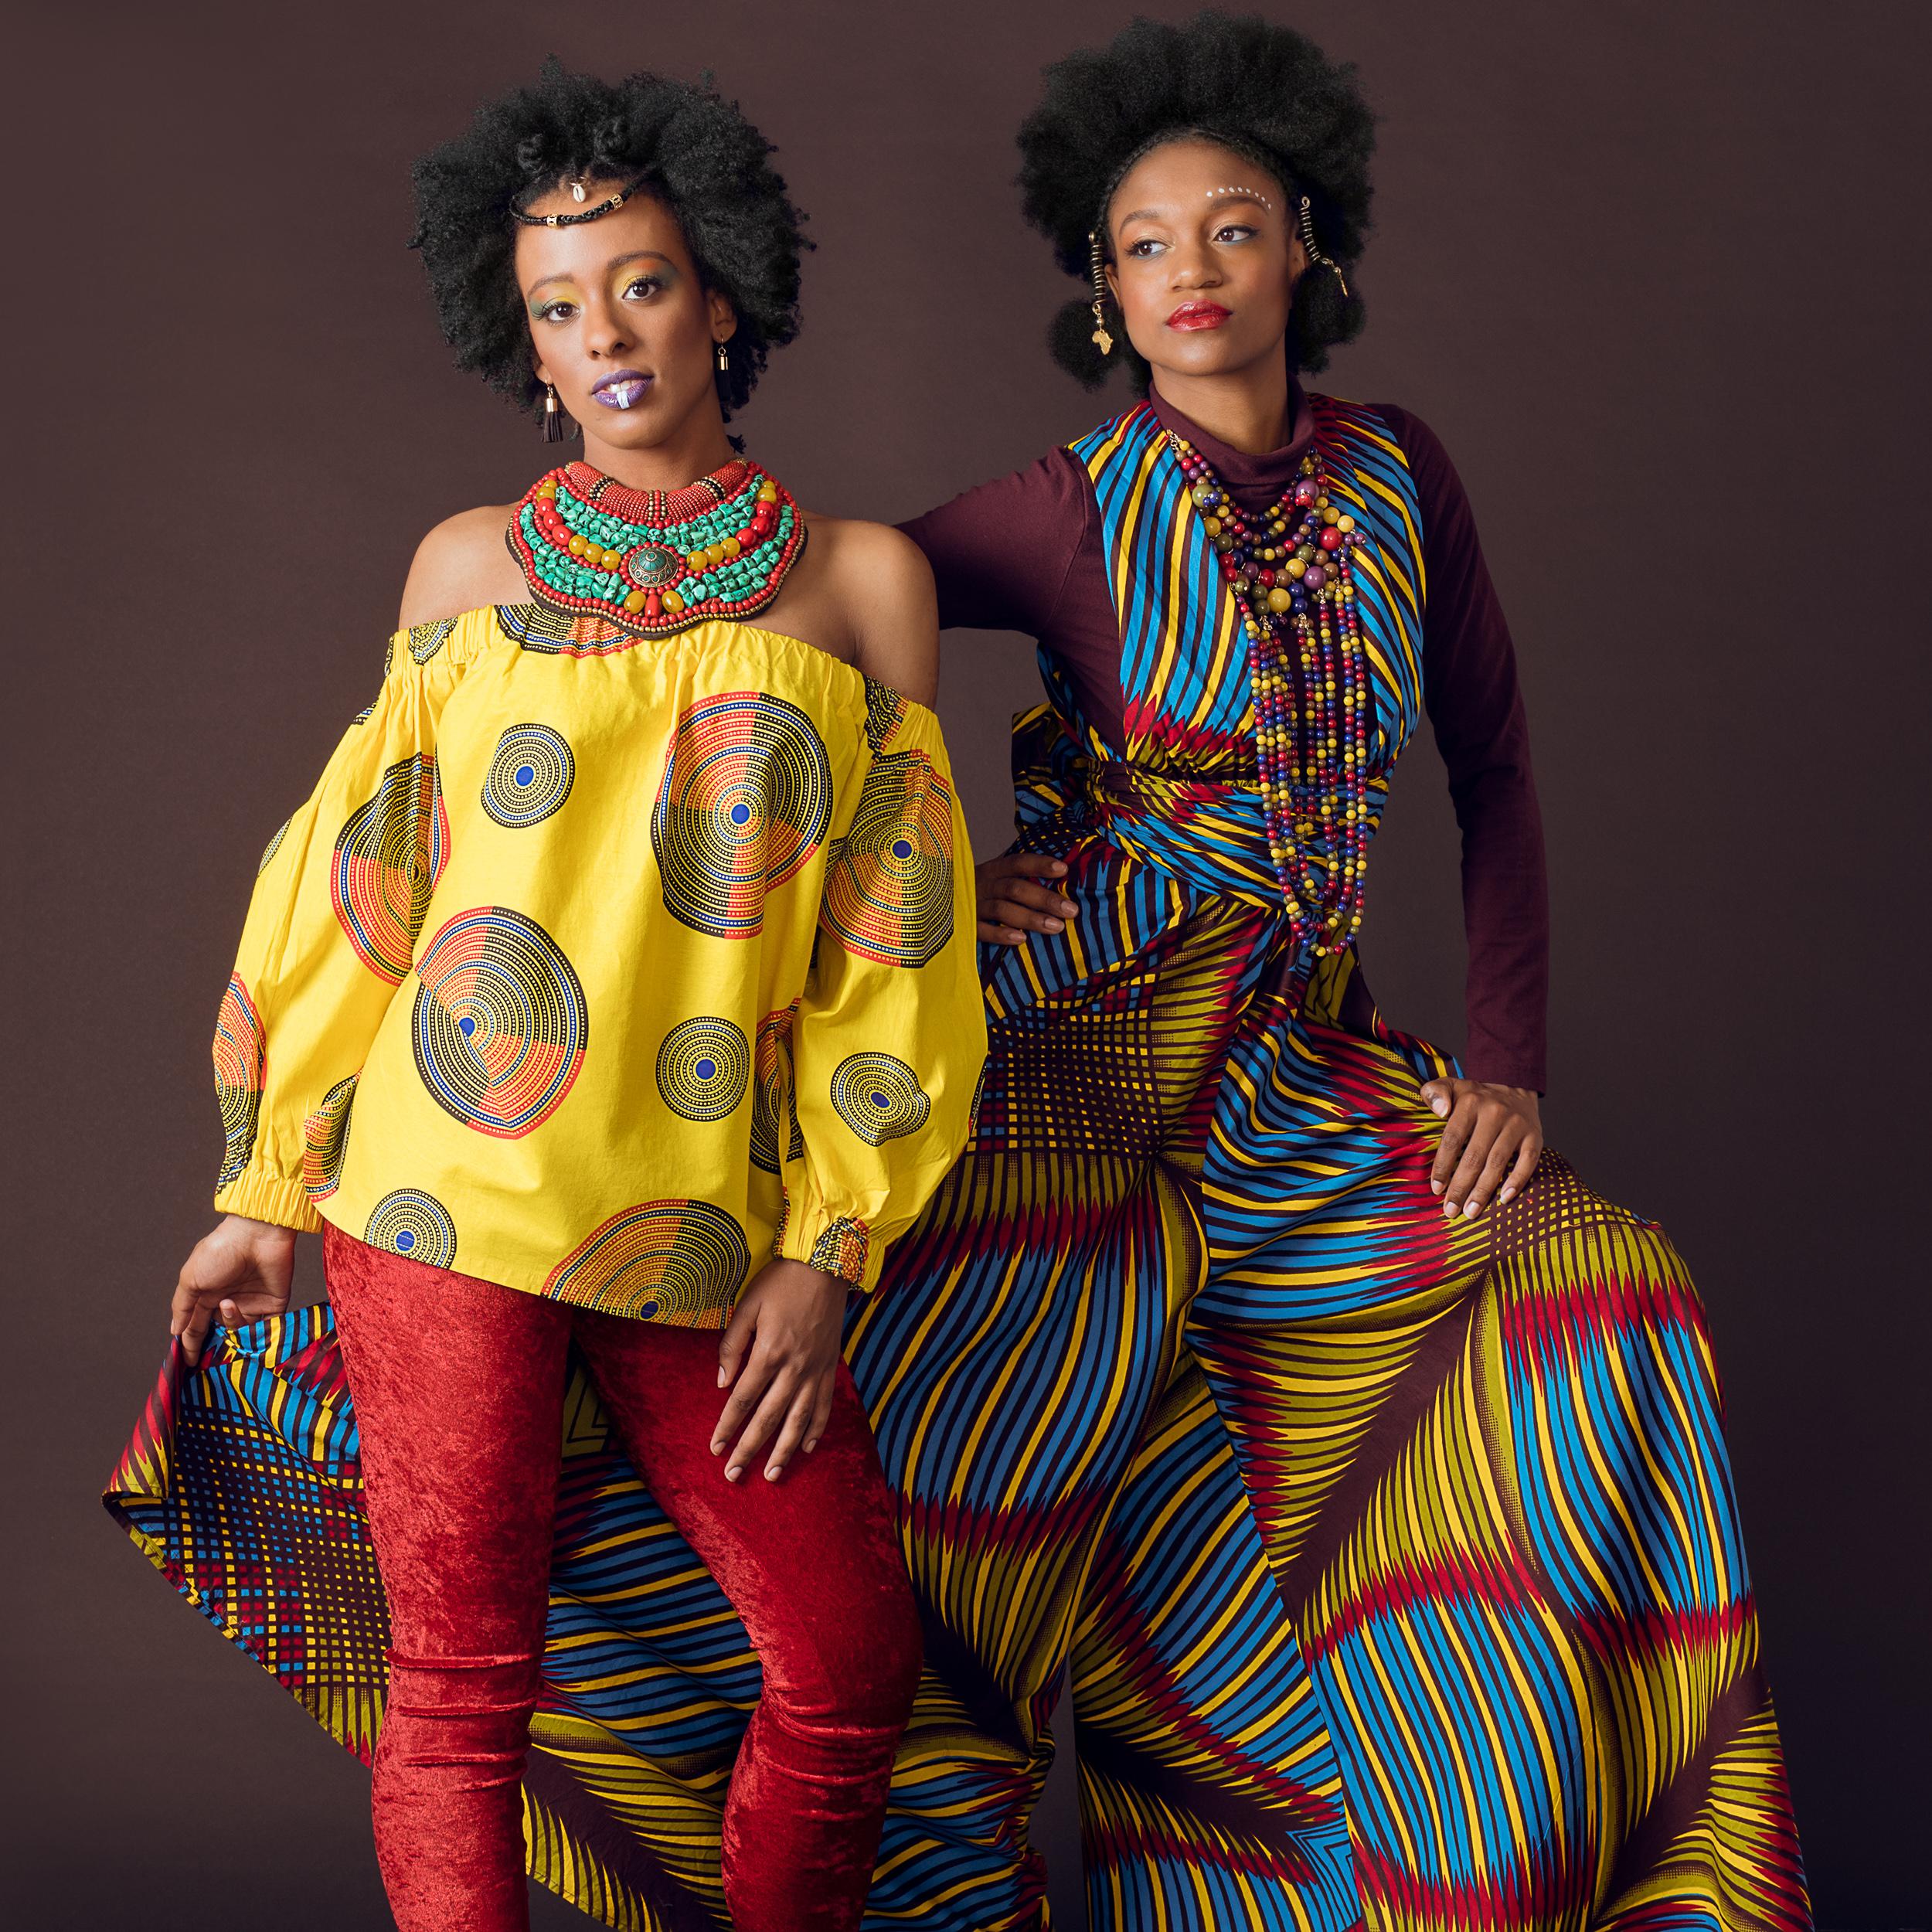 mariah adele and zakeya brown / fashion: codi banks / styling: dareme by tynae / mua: nikki brown / hair: kiera moss